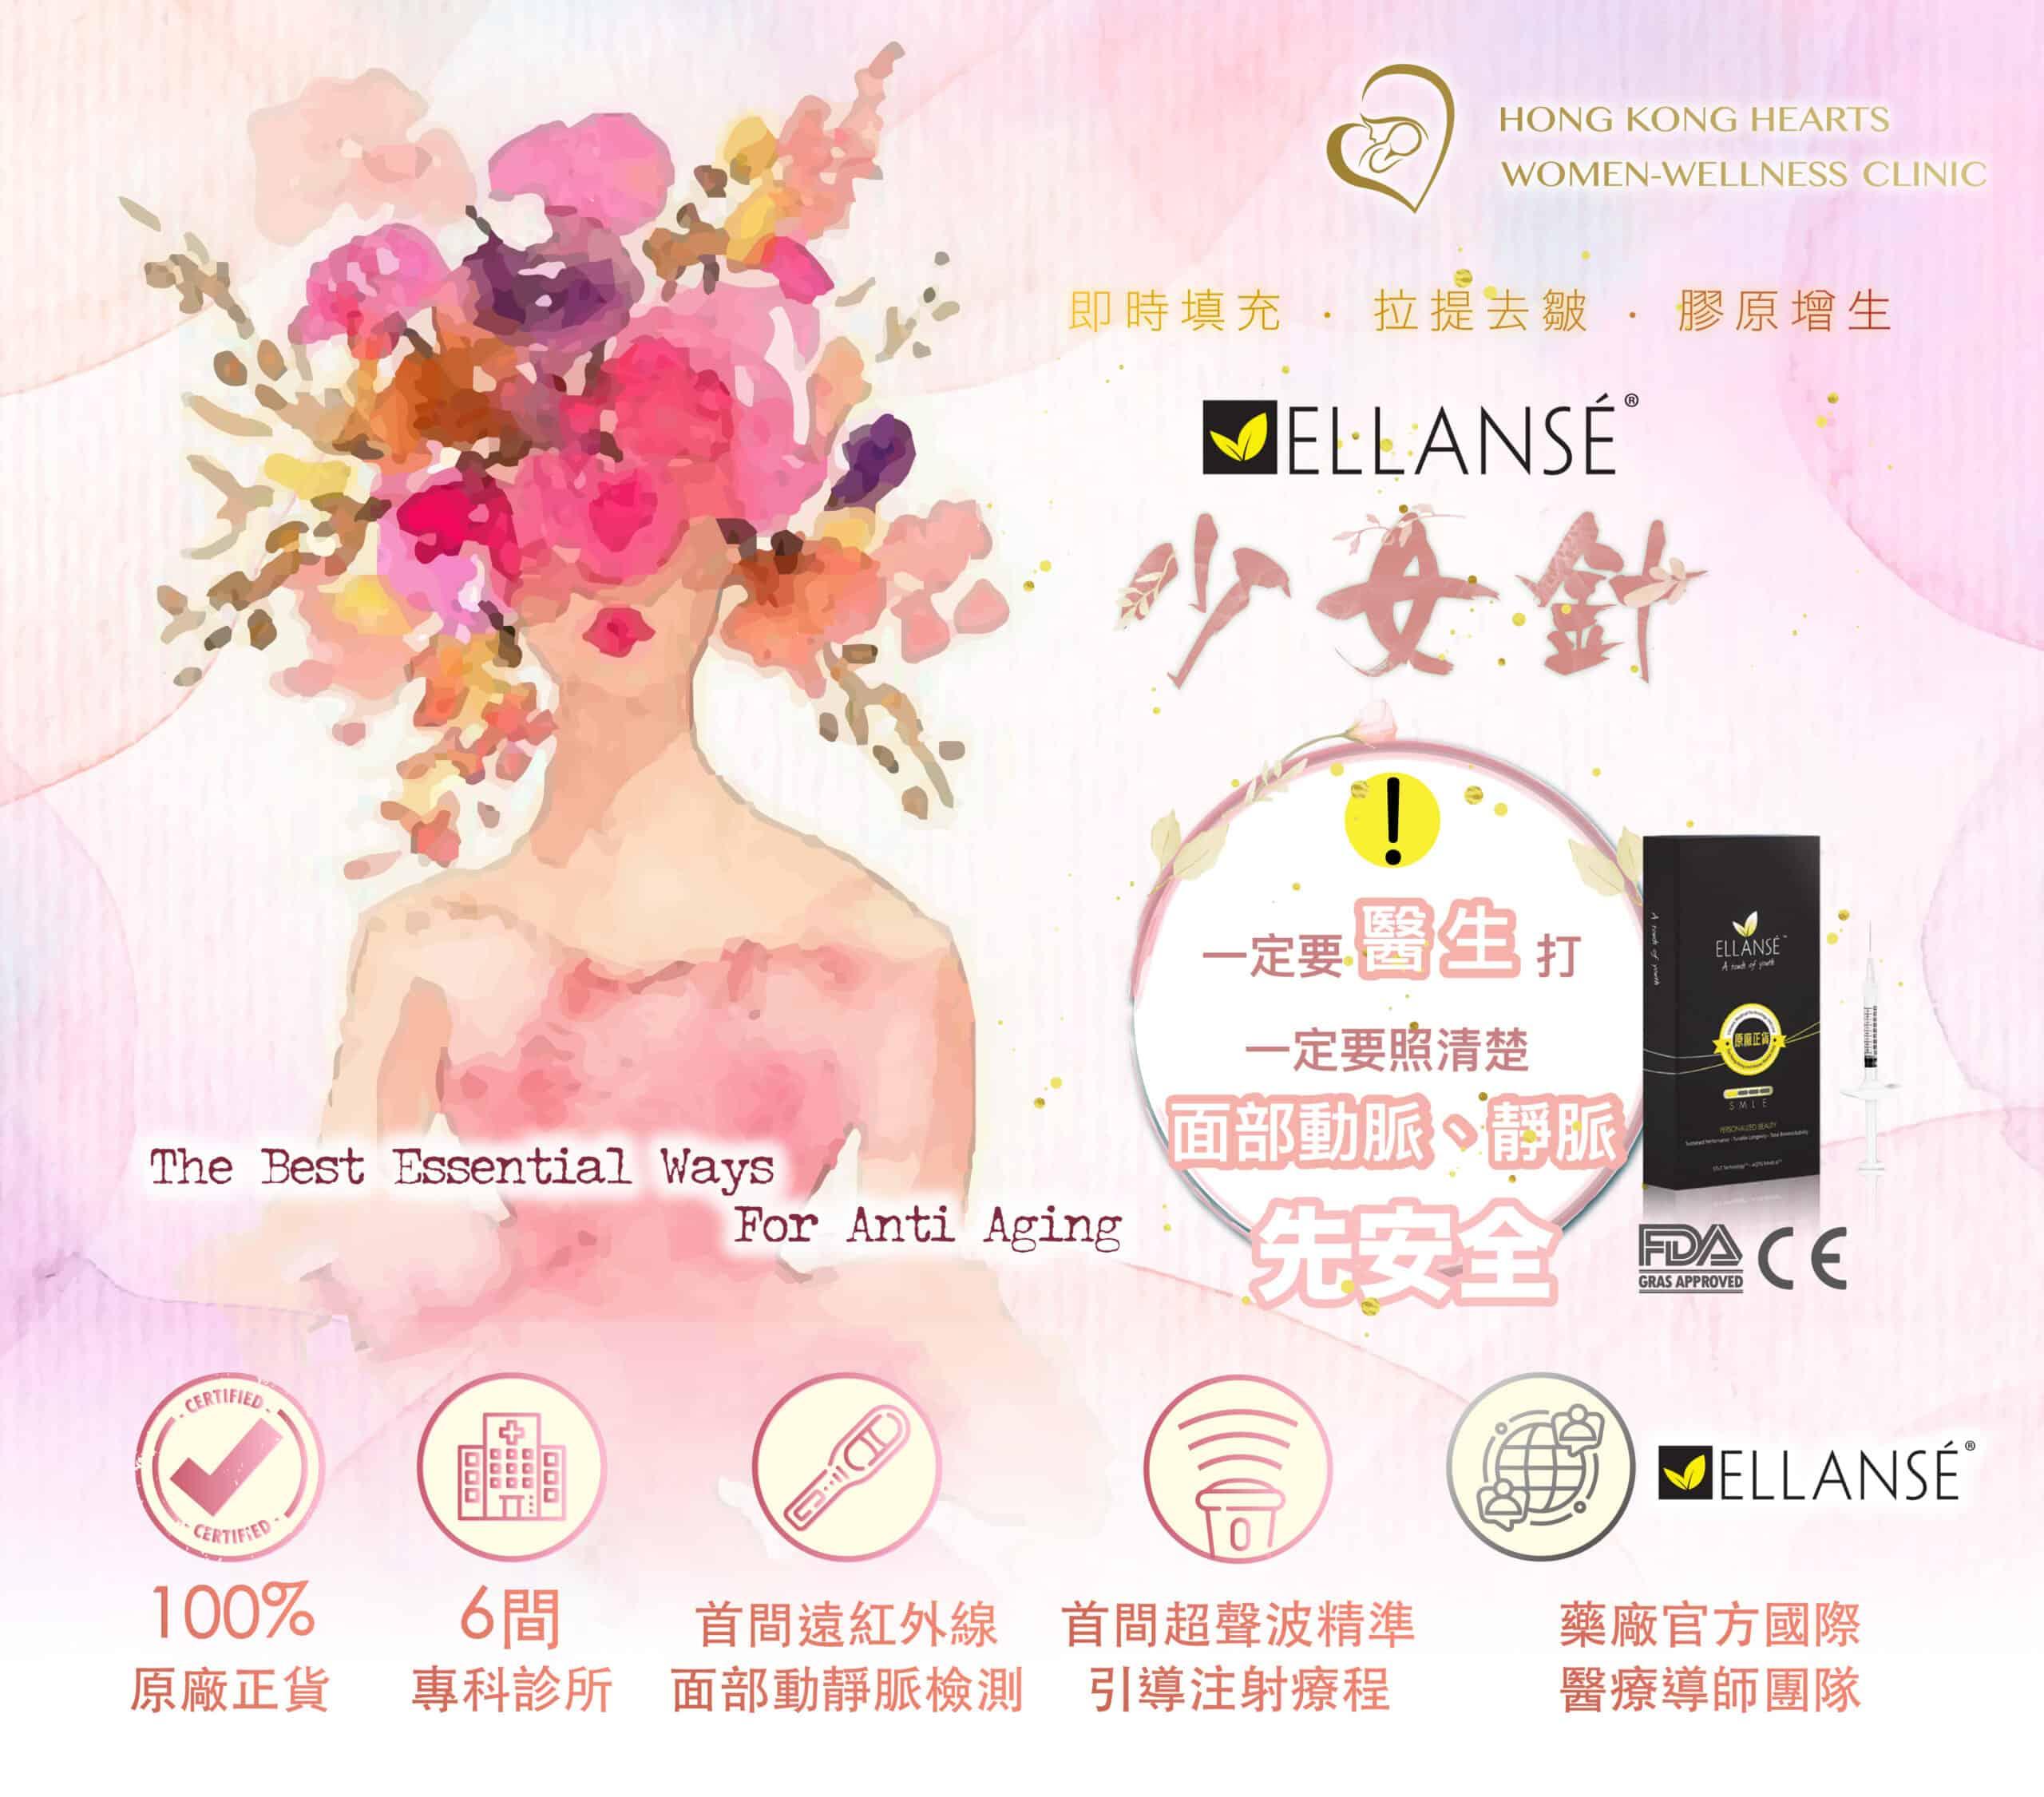 Ellanse少女針 Ellanse 01 banner 16 02 011 scaled